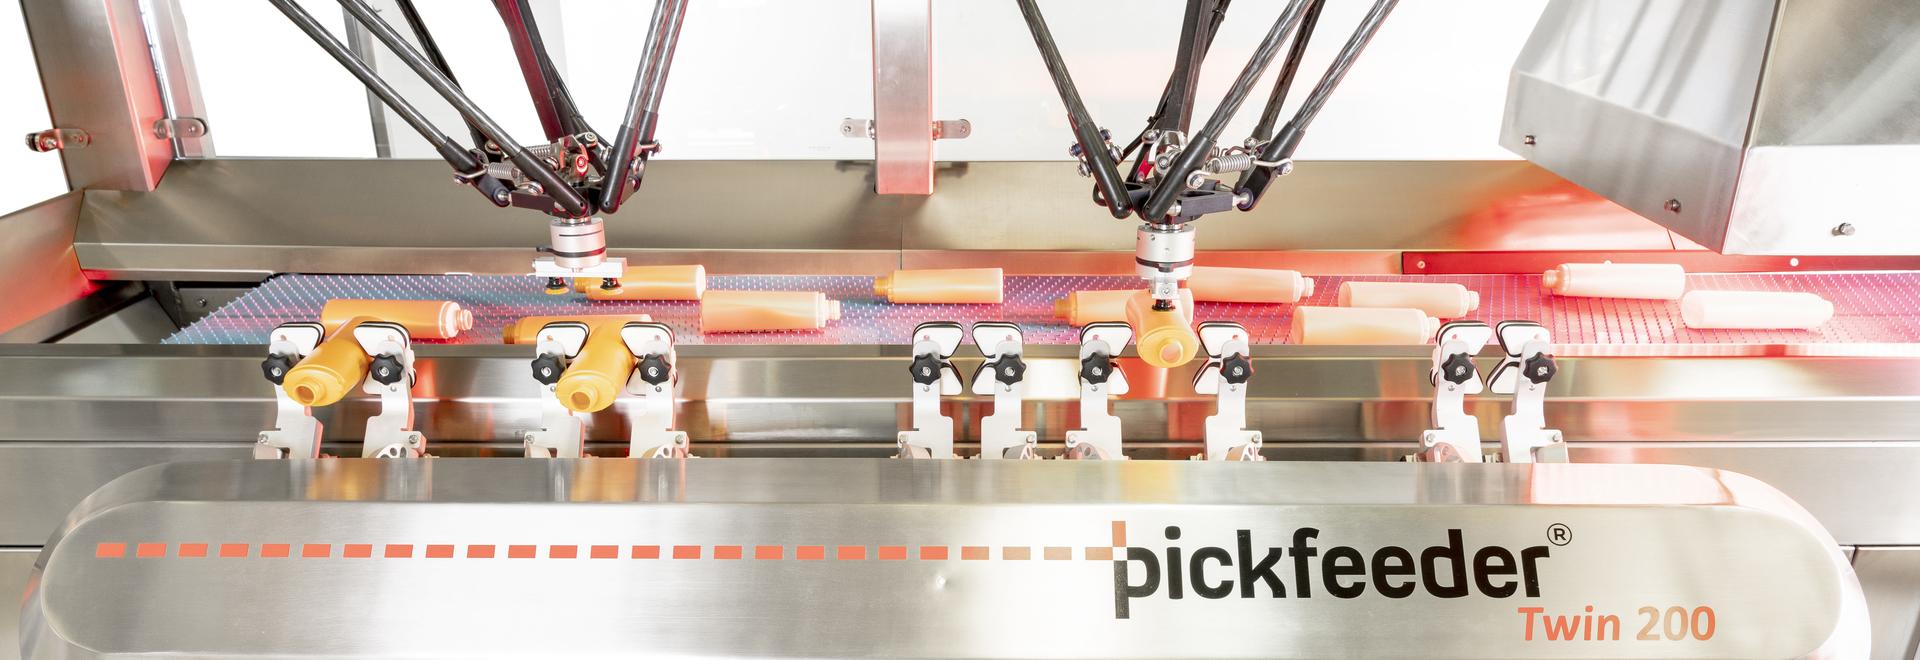 Robotic bottle unscrambler Pickfeeder Twin 200